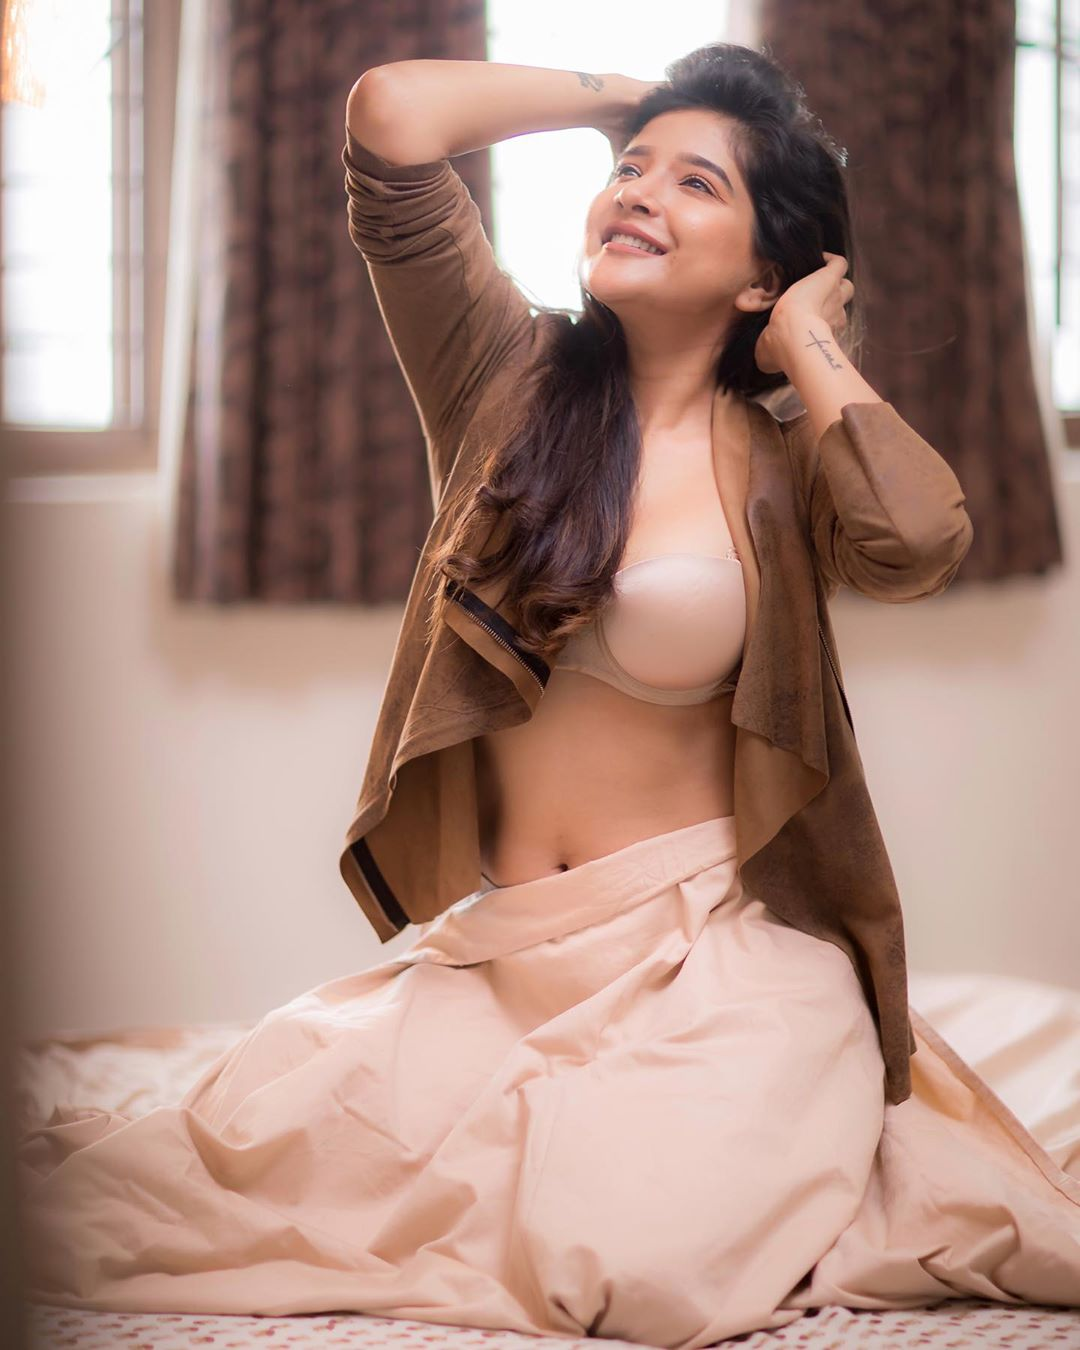 Sakshi Agarwal Stunning Stills From Latest Photoshoot